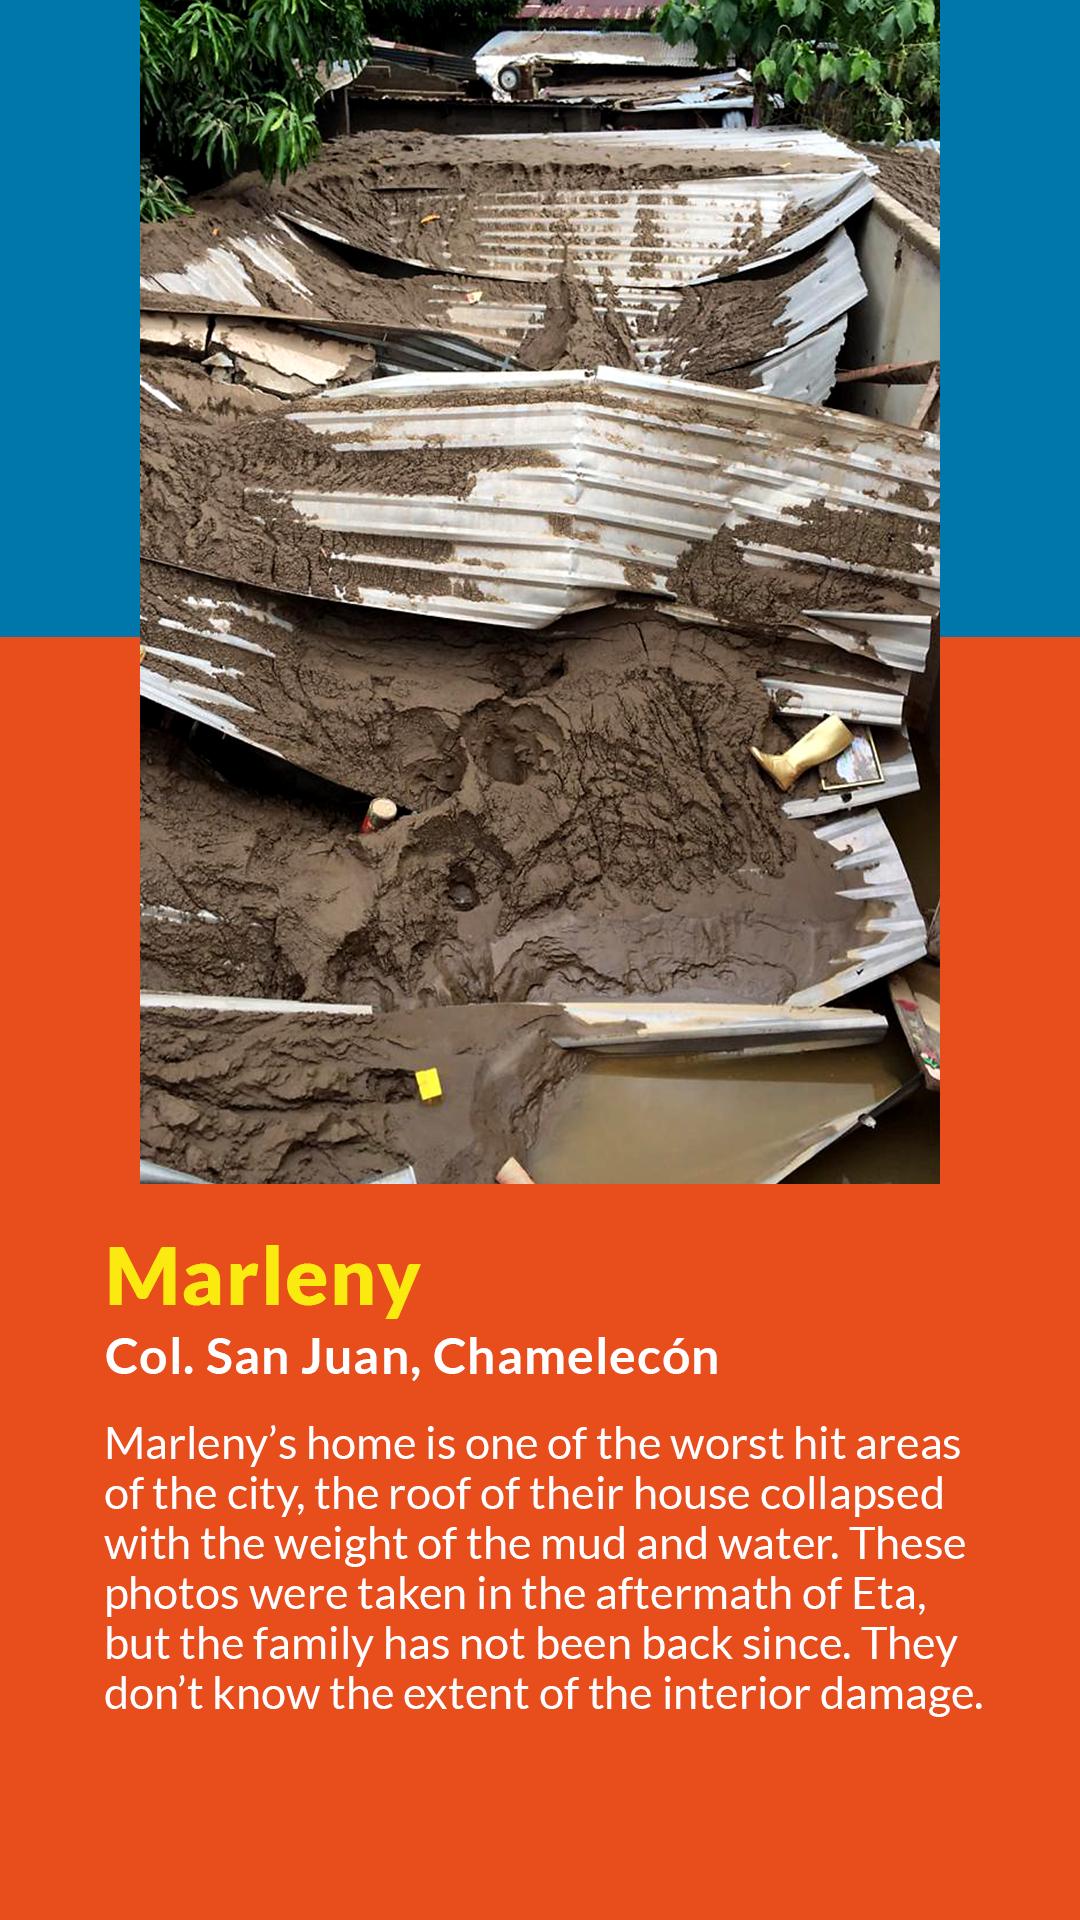 3_Marleny A copy